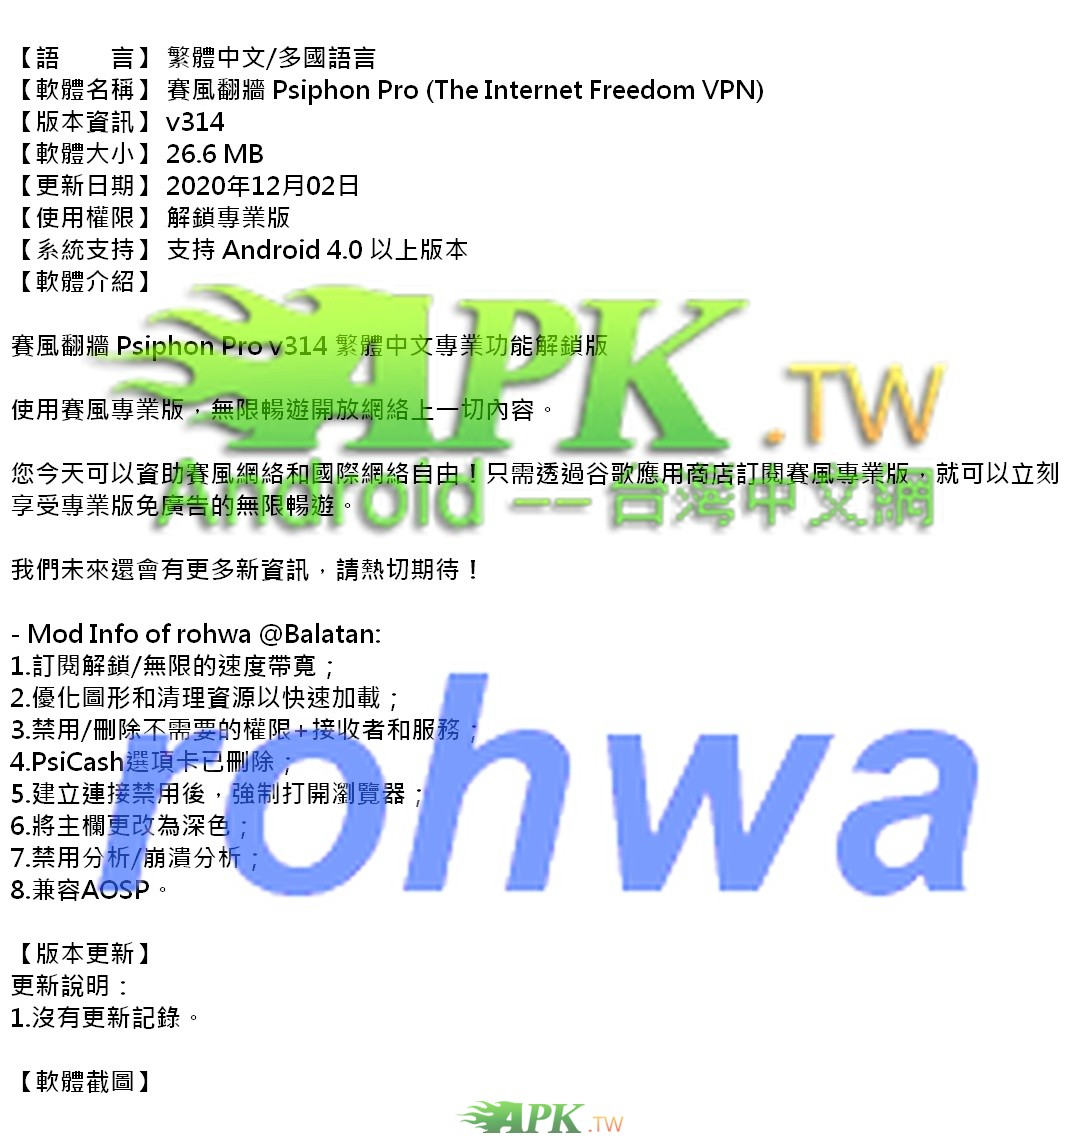 Psiphon_Pro_314_.jpg